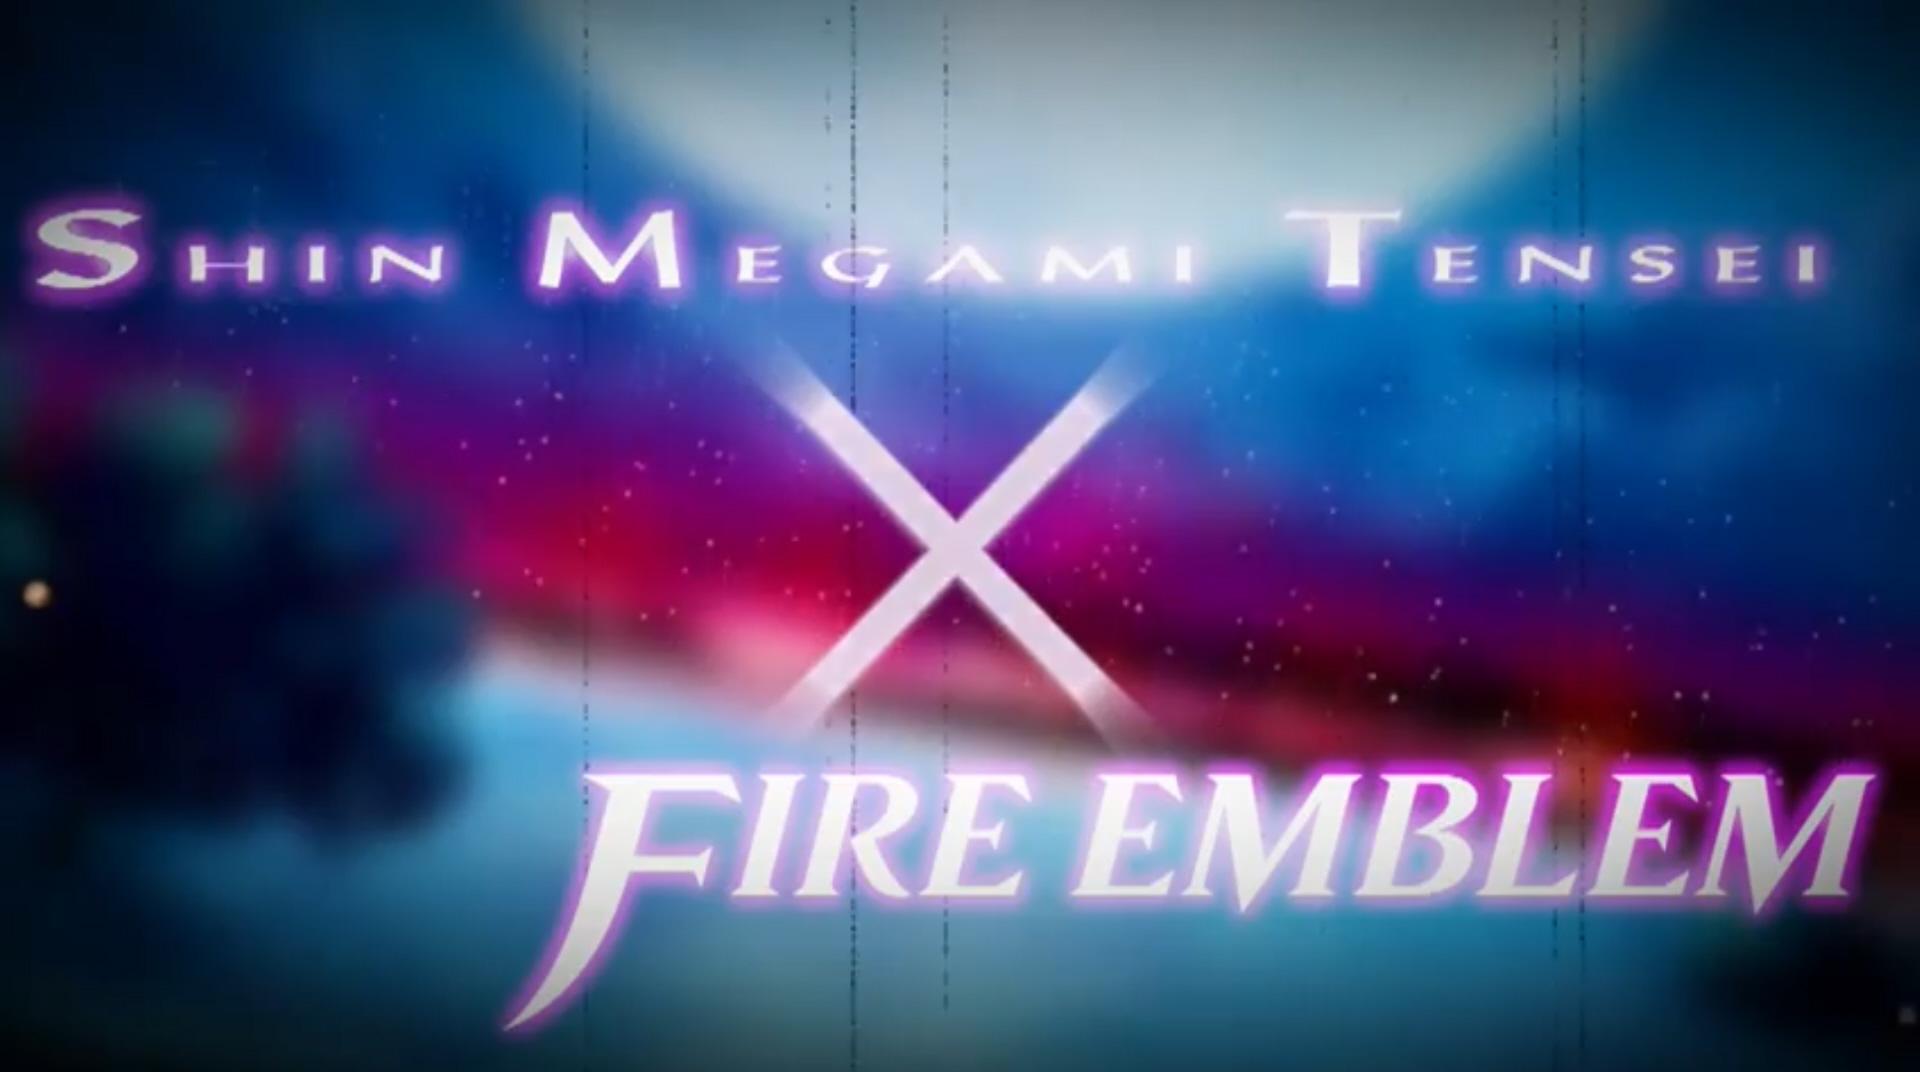 shin-megami-tensei-x-fire-emblem-wallpaper-title